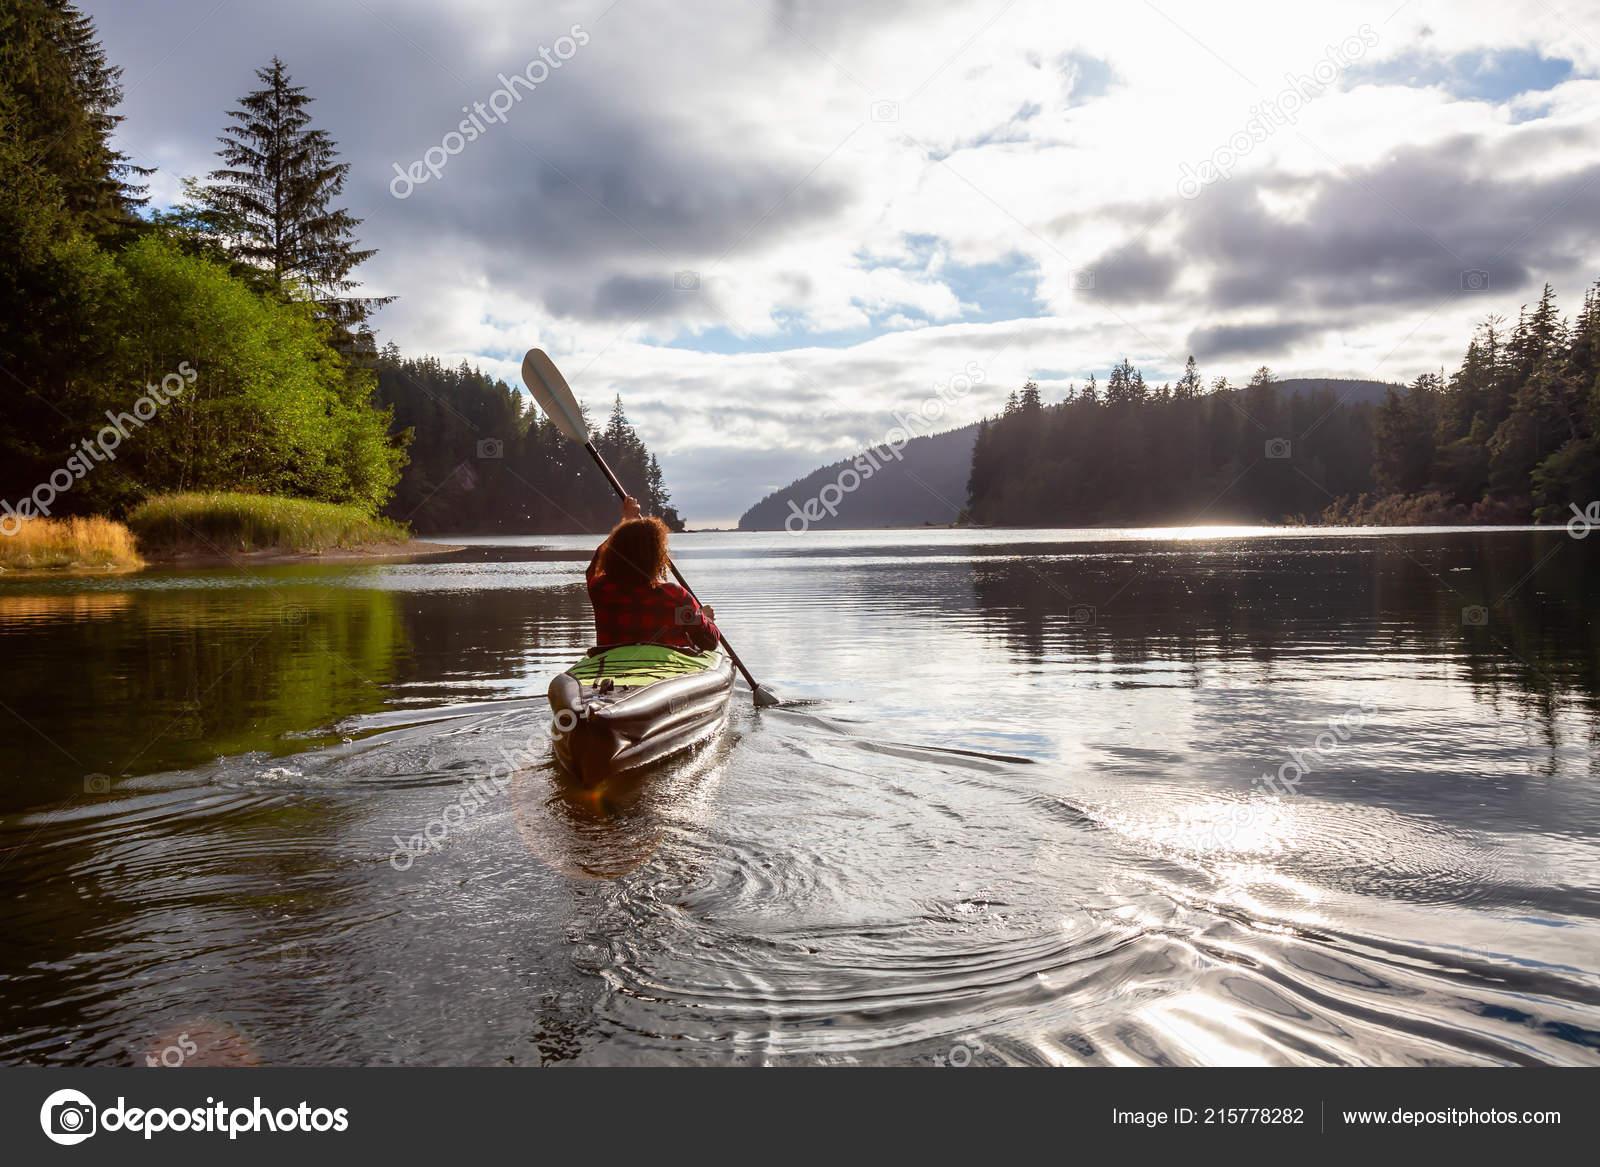 d86af2aefd0e Girl Kayaking River Cloudy Summer Day Taken Cape Scott Provincial — Stock  Photo